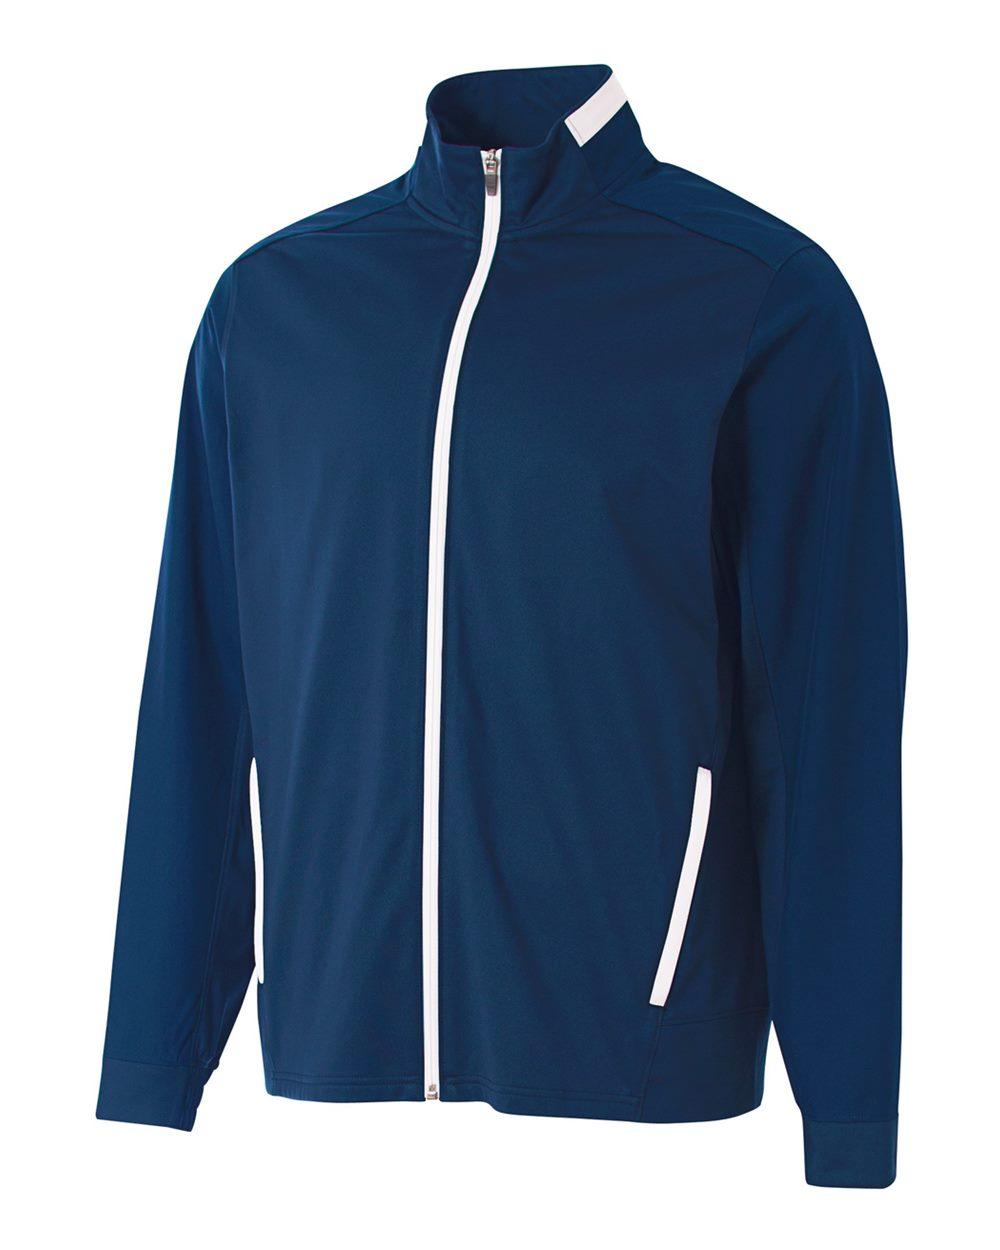 A4 League Full Zip Jacket